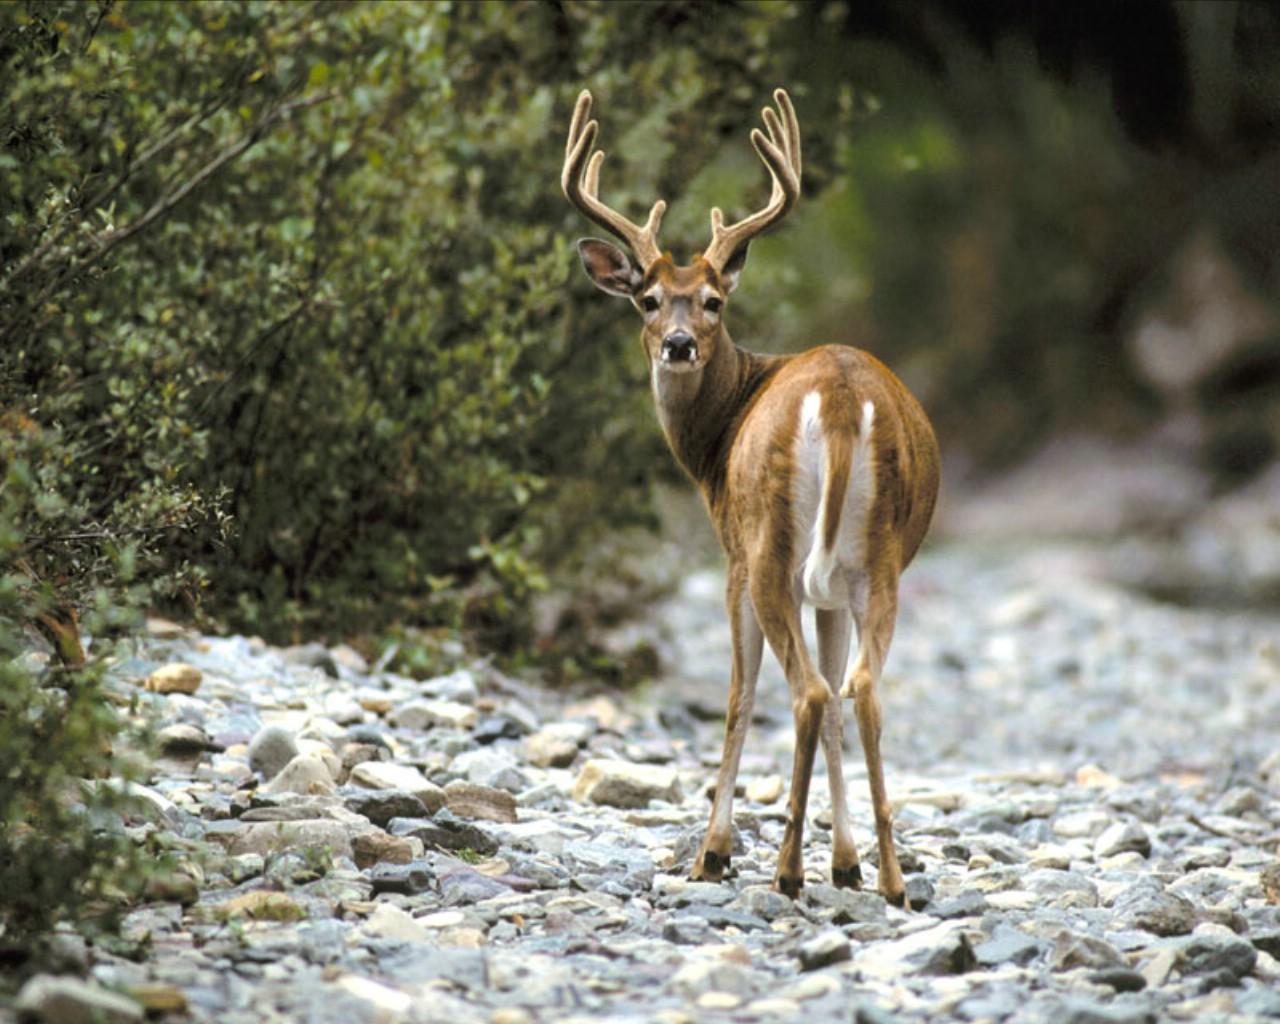 whitetail deer wallpaper 16672 1280x1024 px